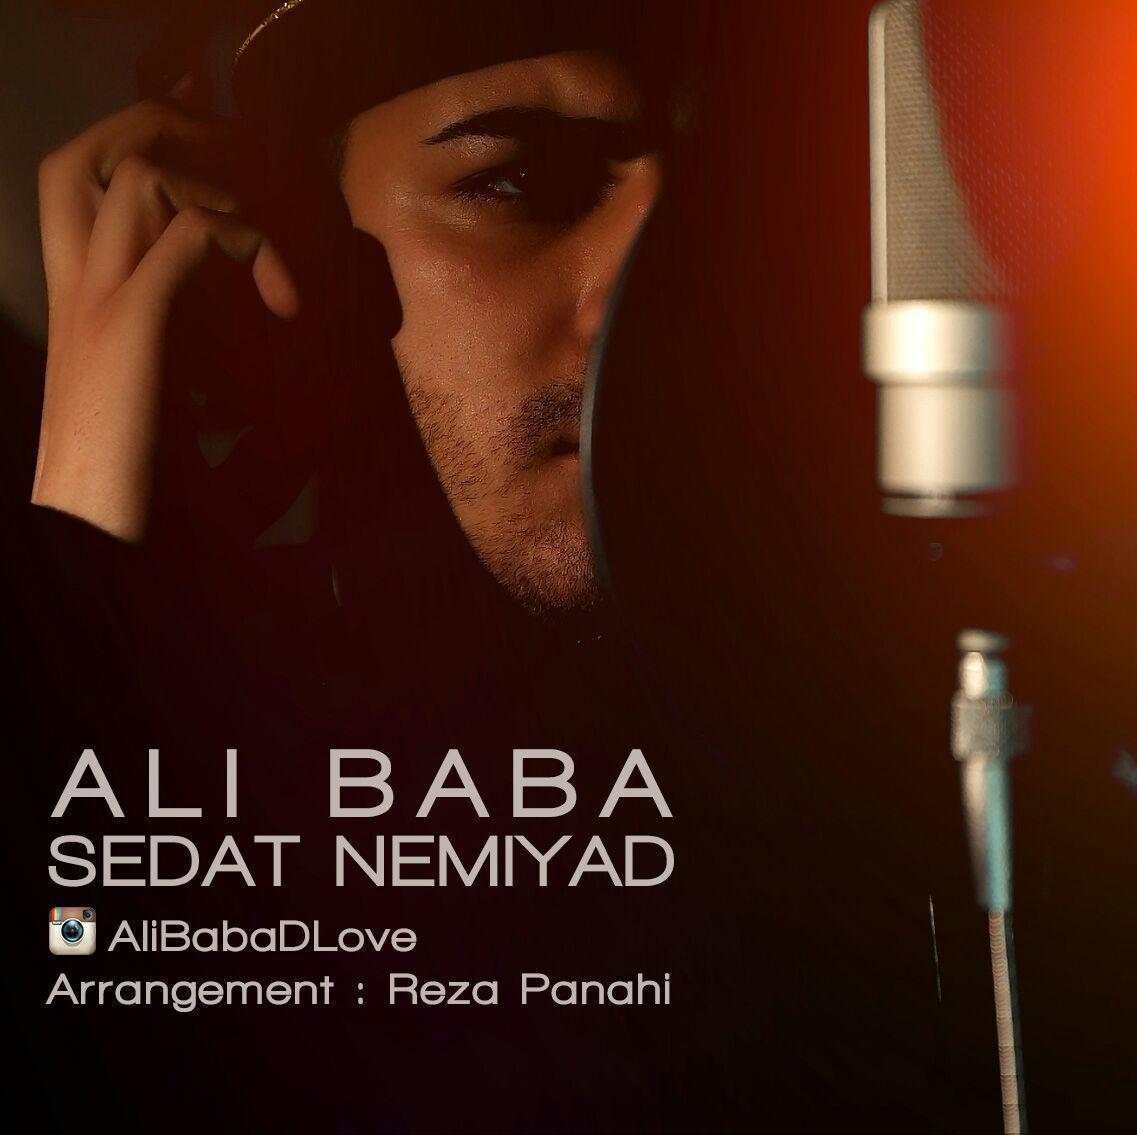 Ali Baba Sedat Nemiad